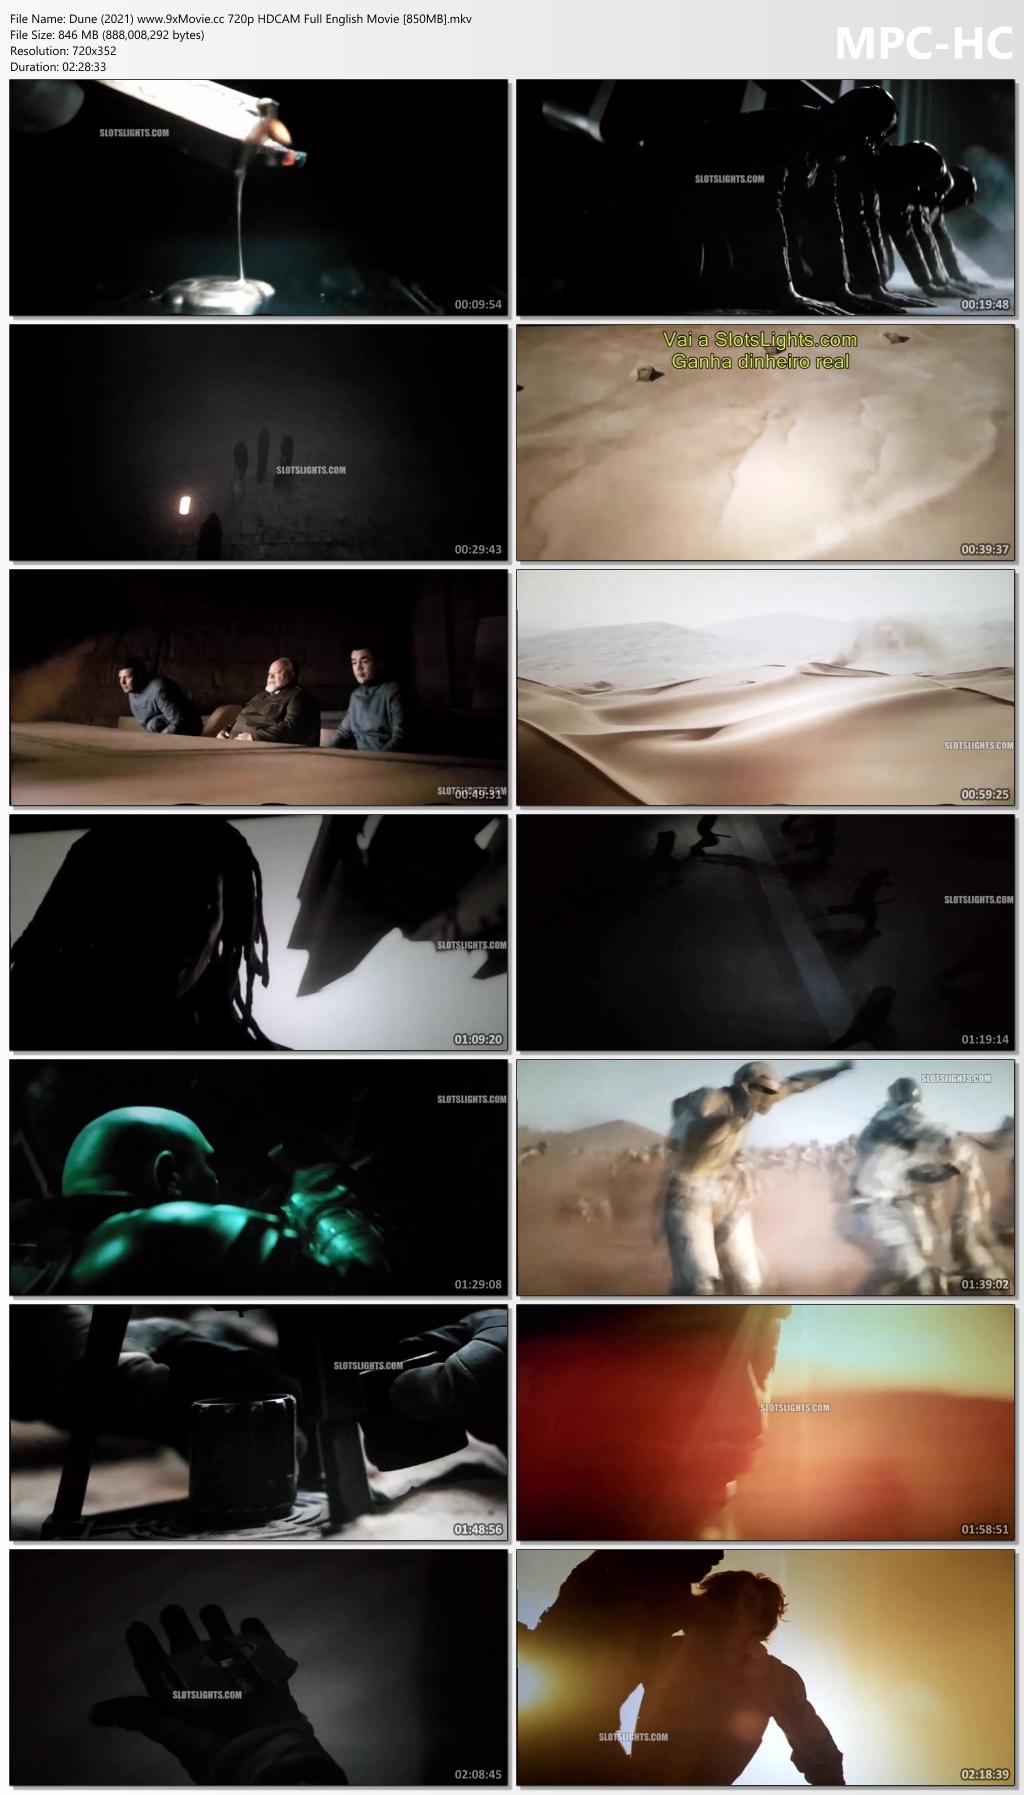 Dune-2021-www-9x-Movie-cc-720p-HDCAM-Full-English-Movie-850-MB-mkv